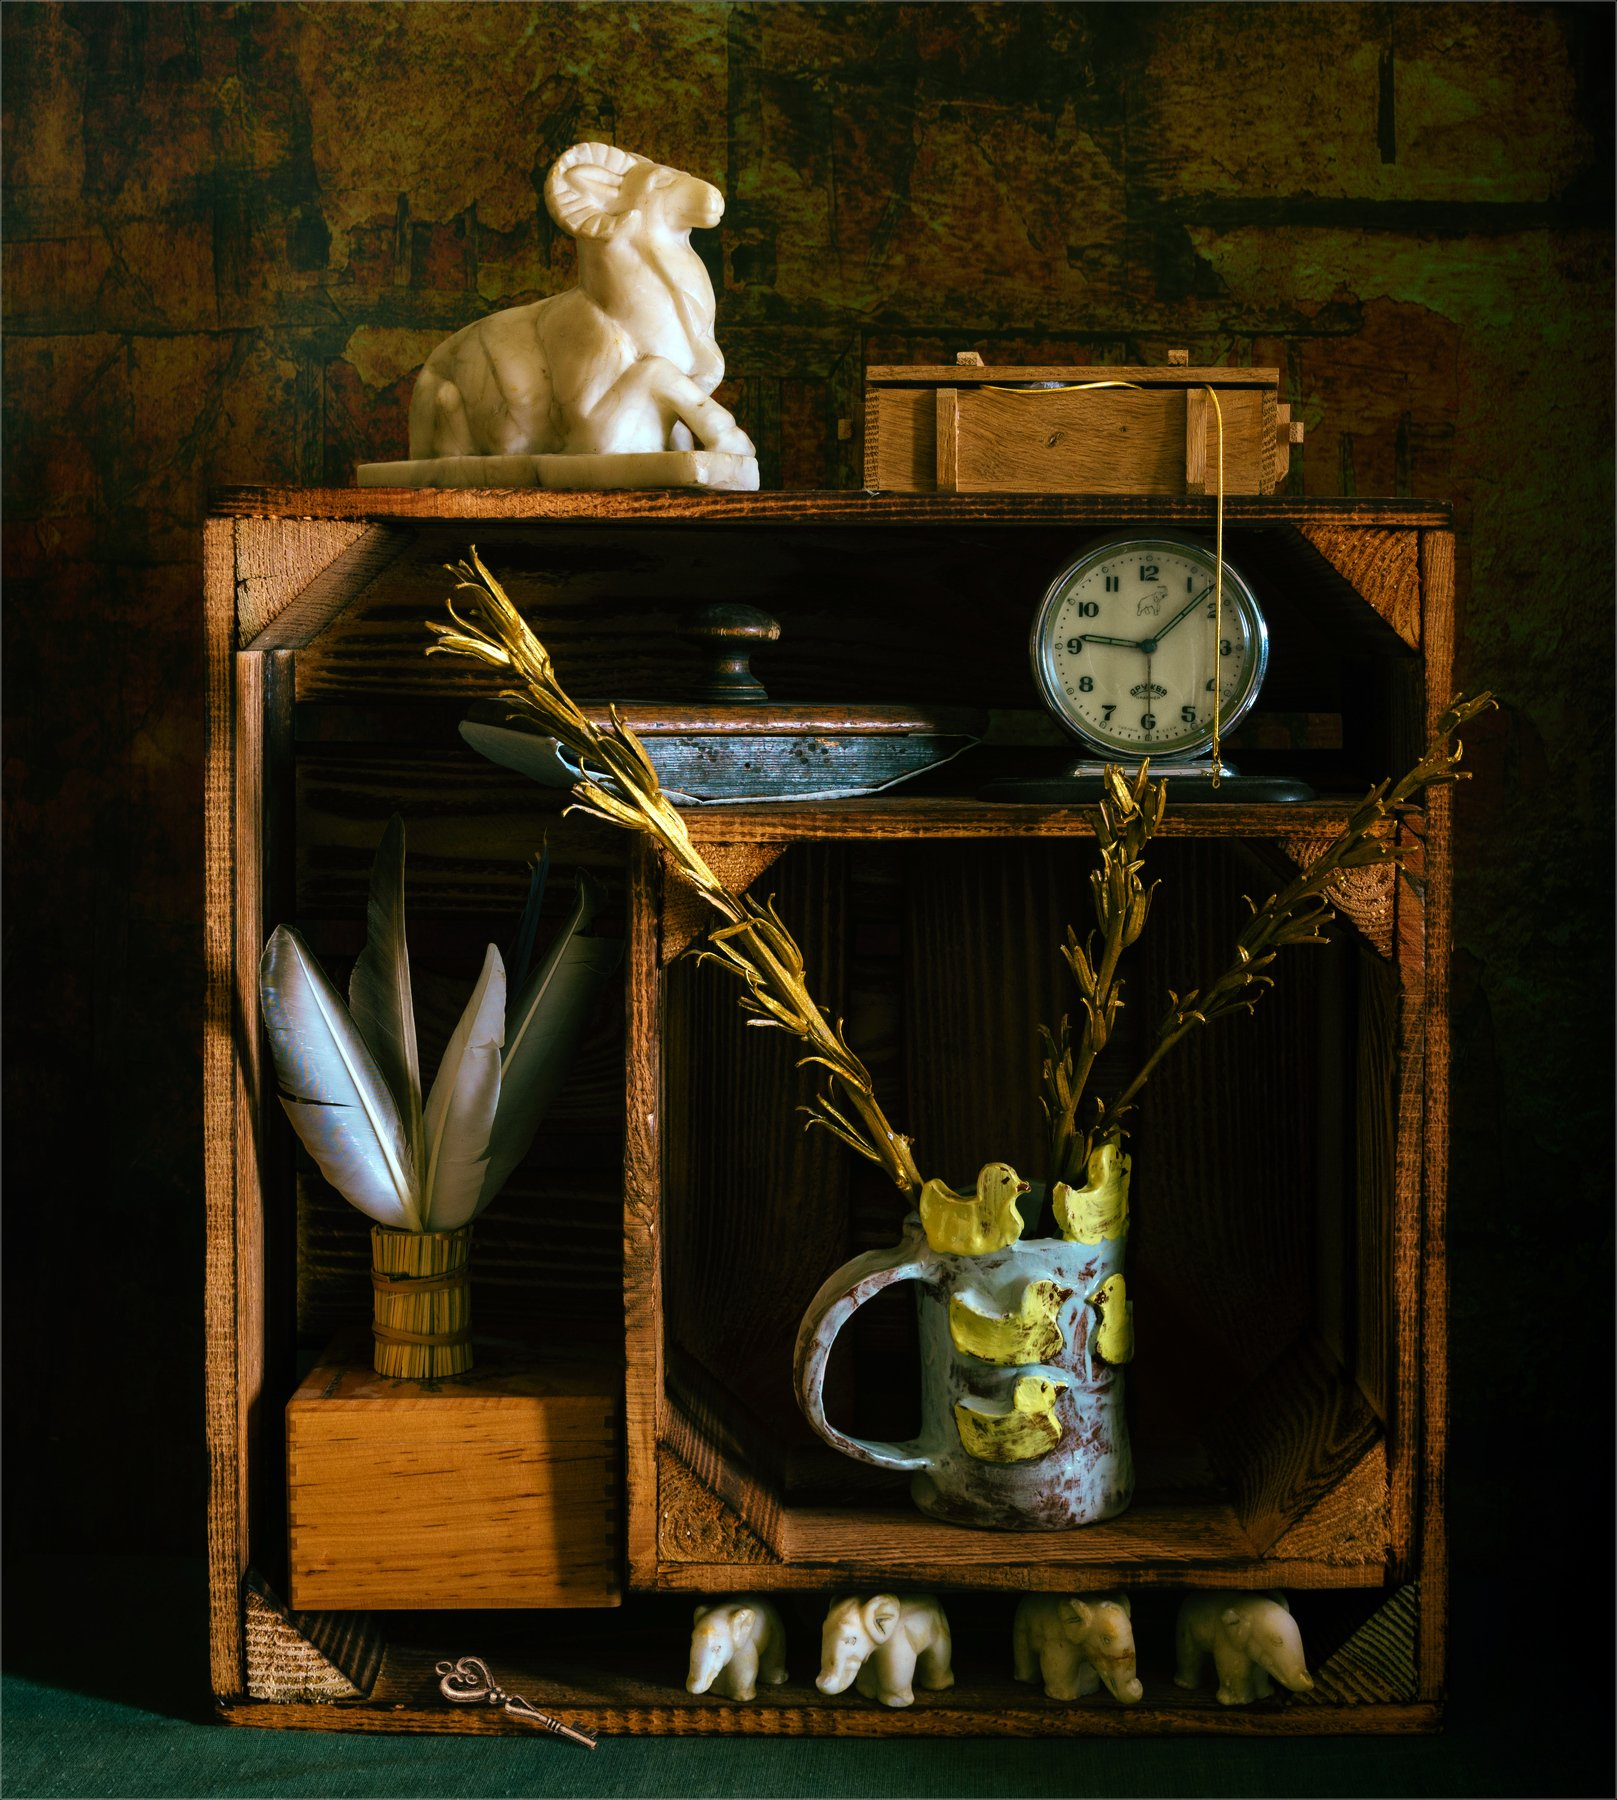 still life, натюрморт,  природа,  винтаж, ретро, кич, часы, фигурки, слоники, мрамор, камень, перья, пресс-папье, чашка, шкатулка, коробка, ключ,, Михаил MSH